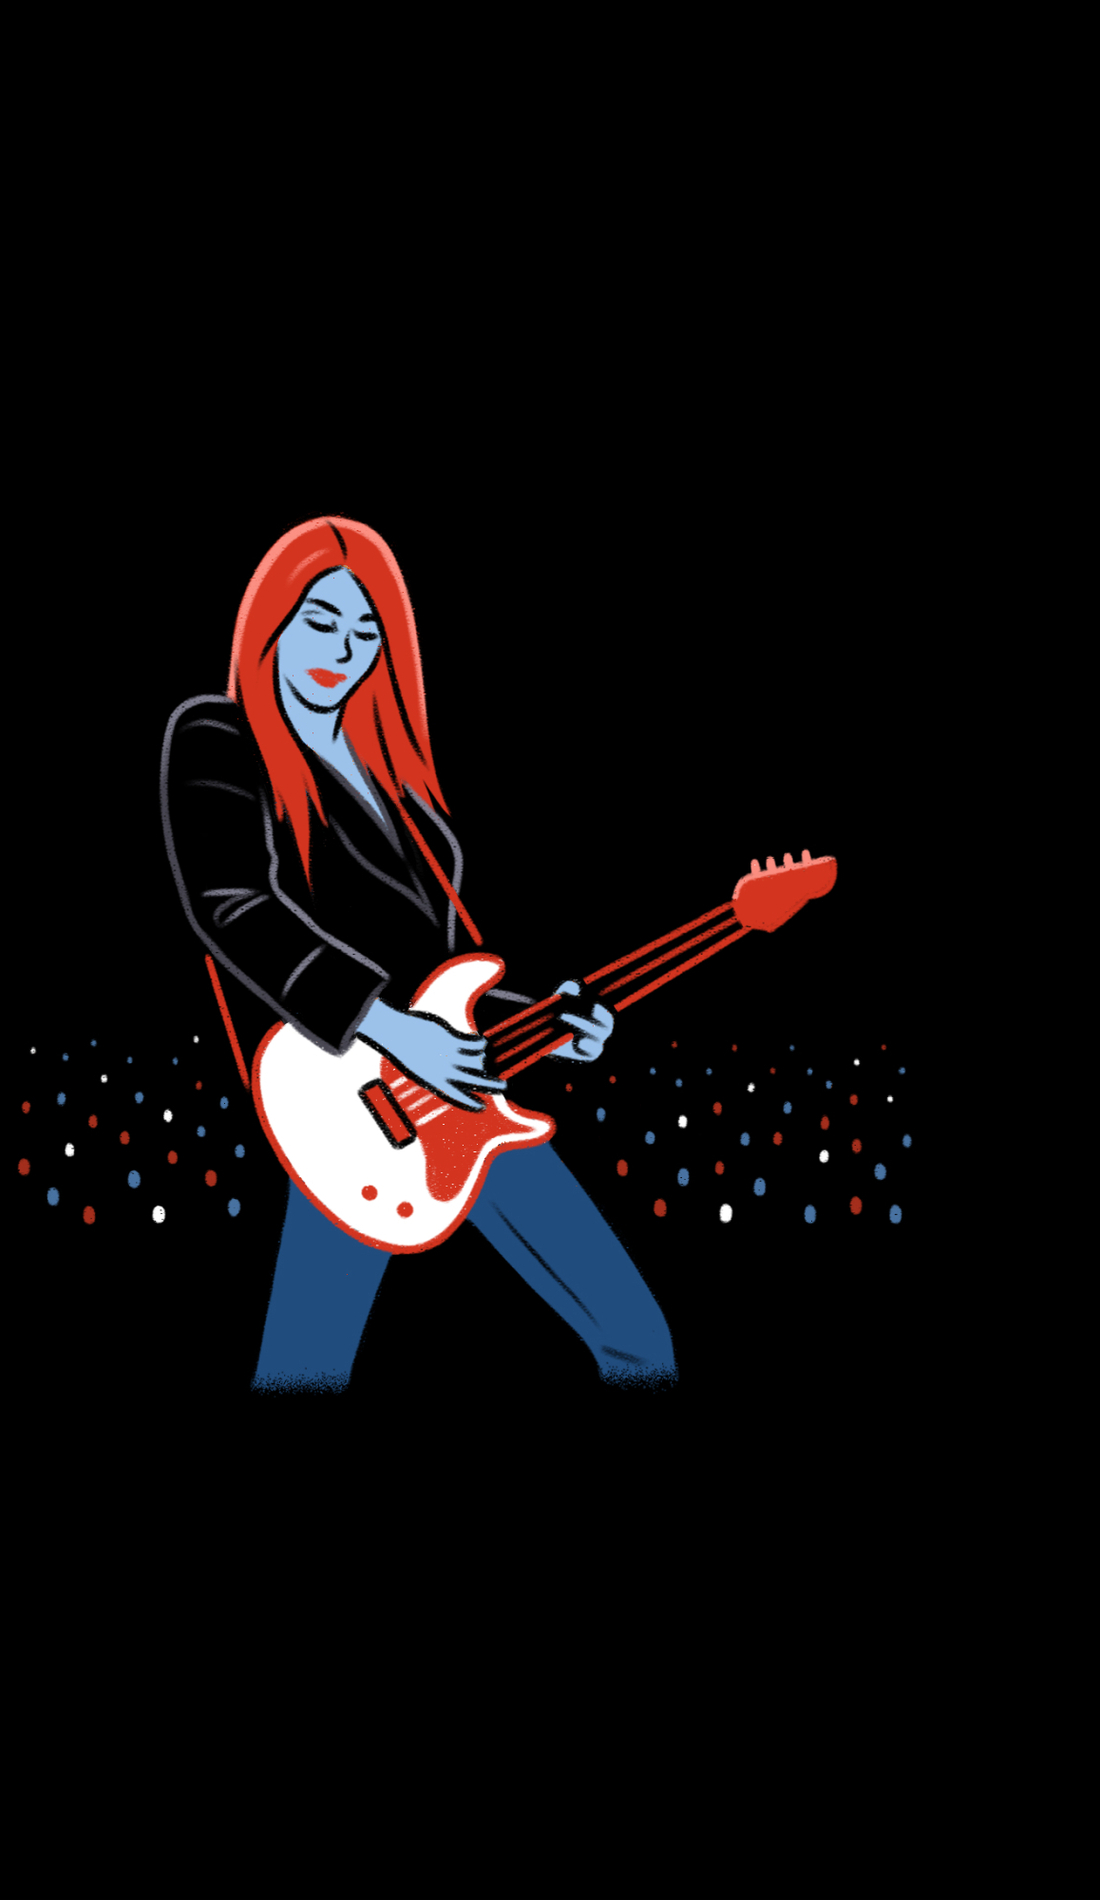 A Jerry Dance Party live event